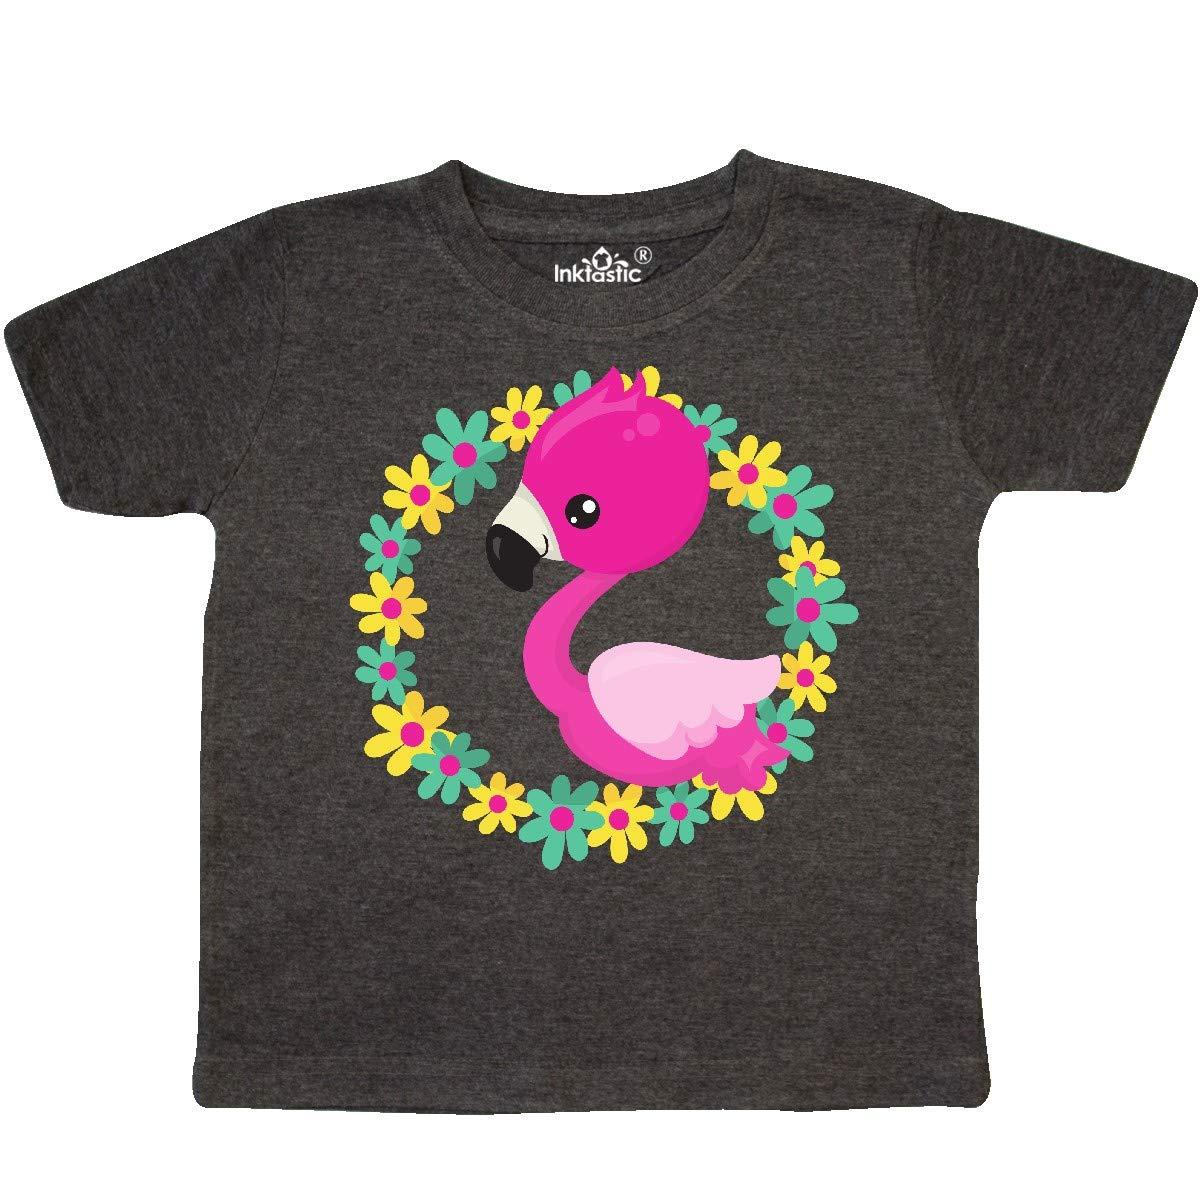 inktastic Cute Flamingo Pink Flamingo Floral Wreath Toddler T-Shirt